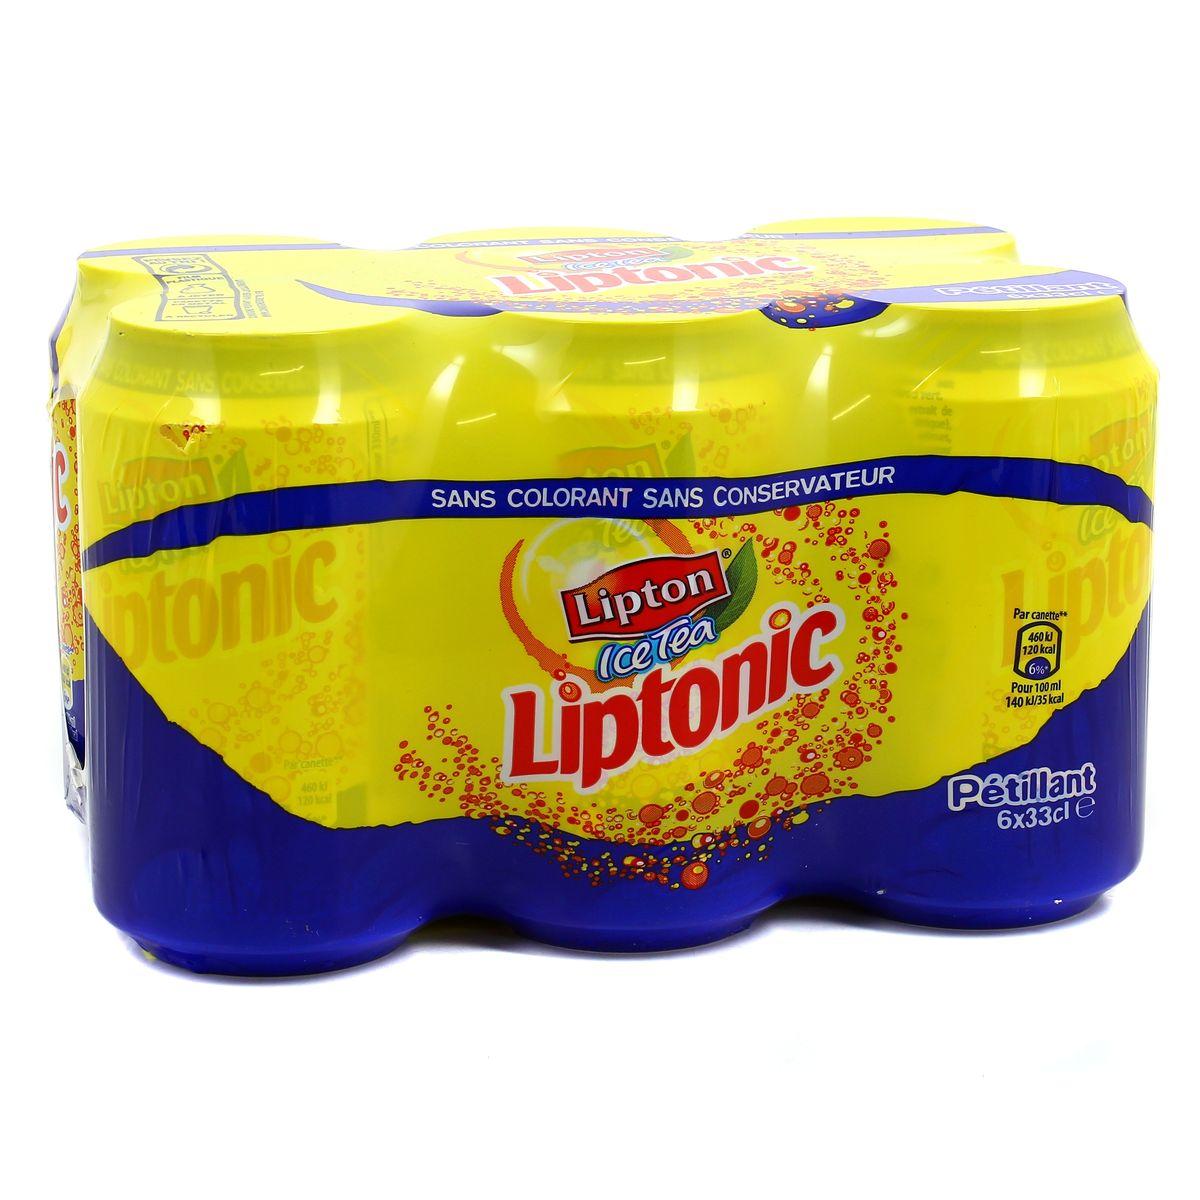 Pack de Liptonic (6 x 33 cl)